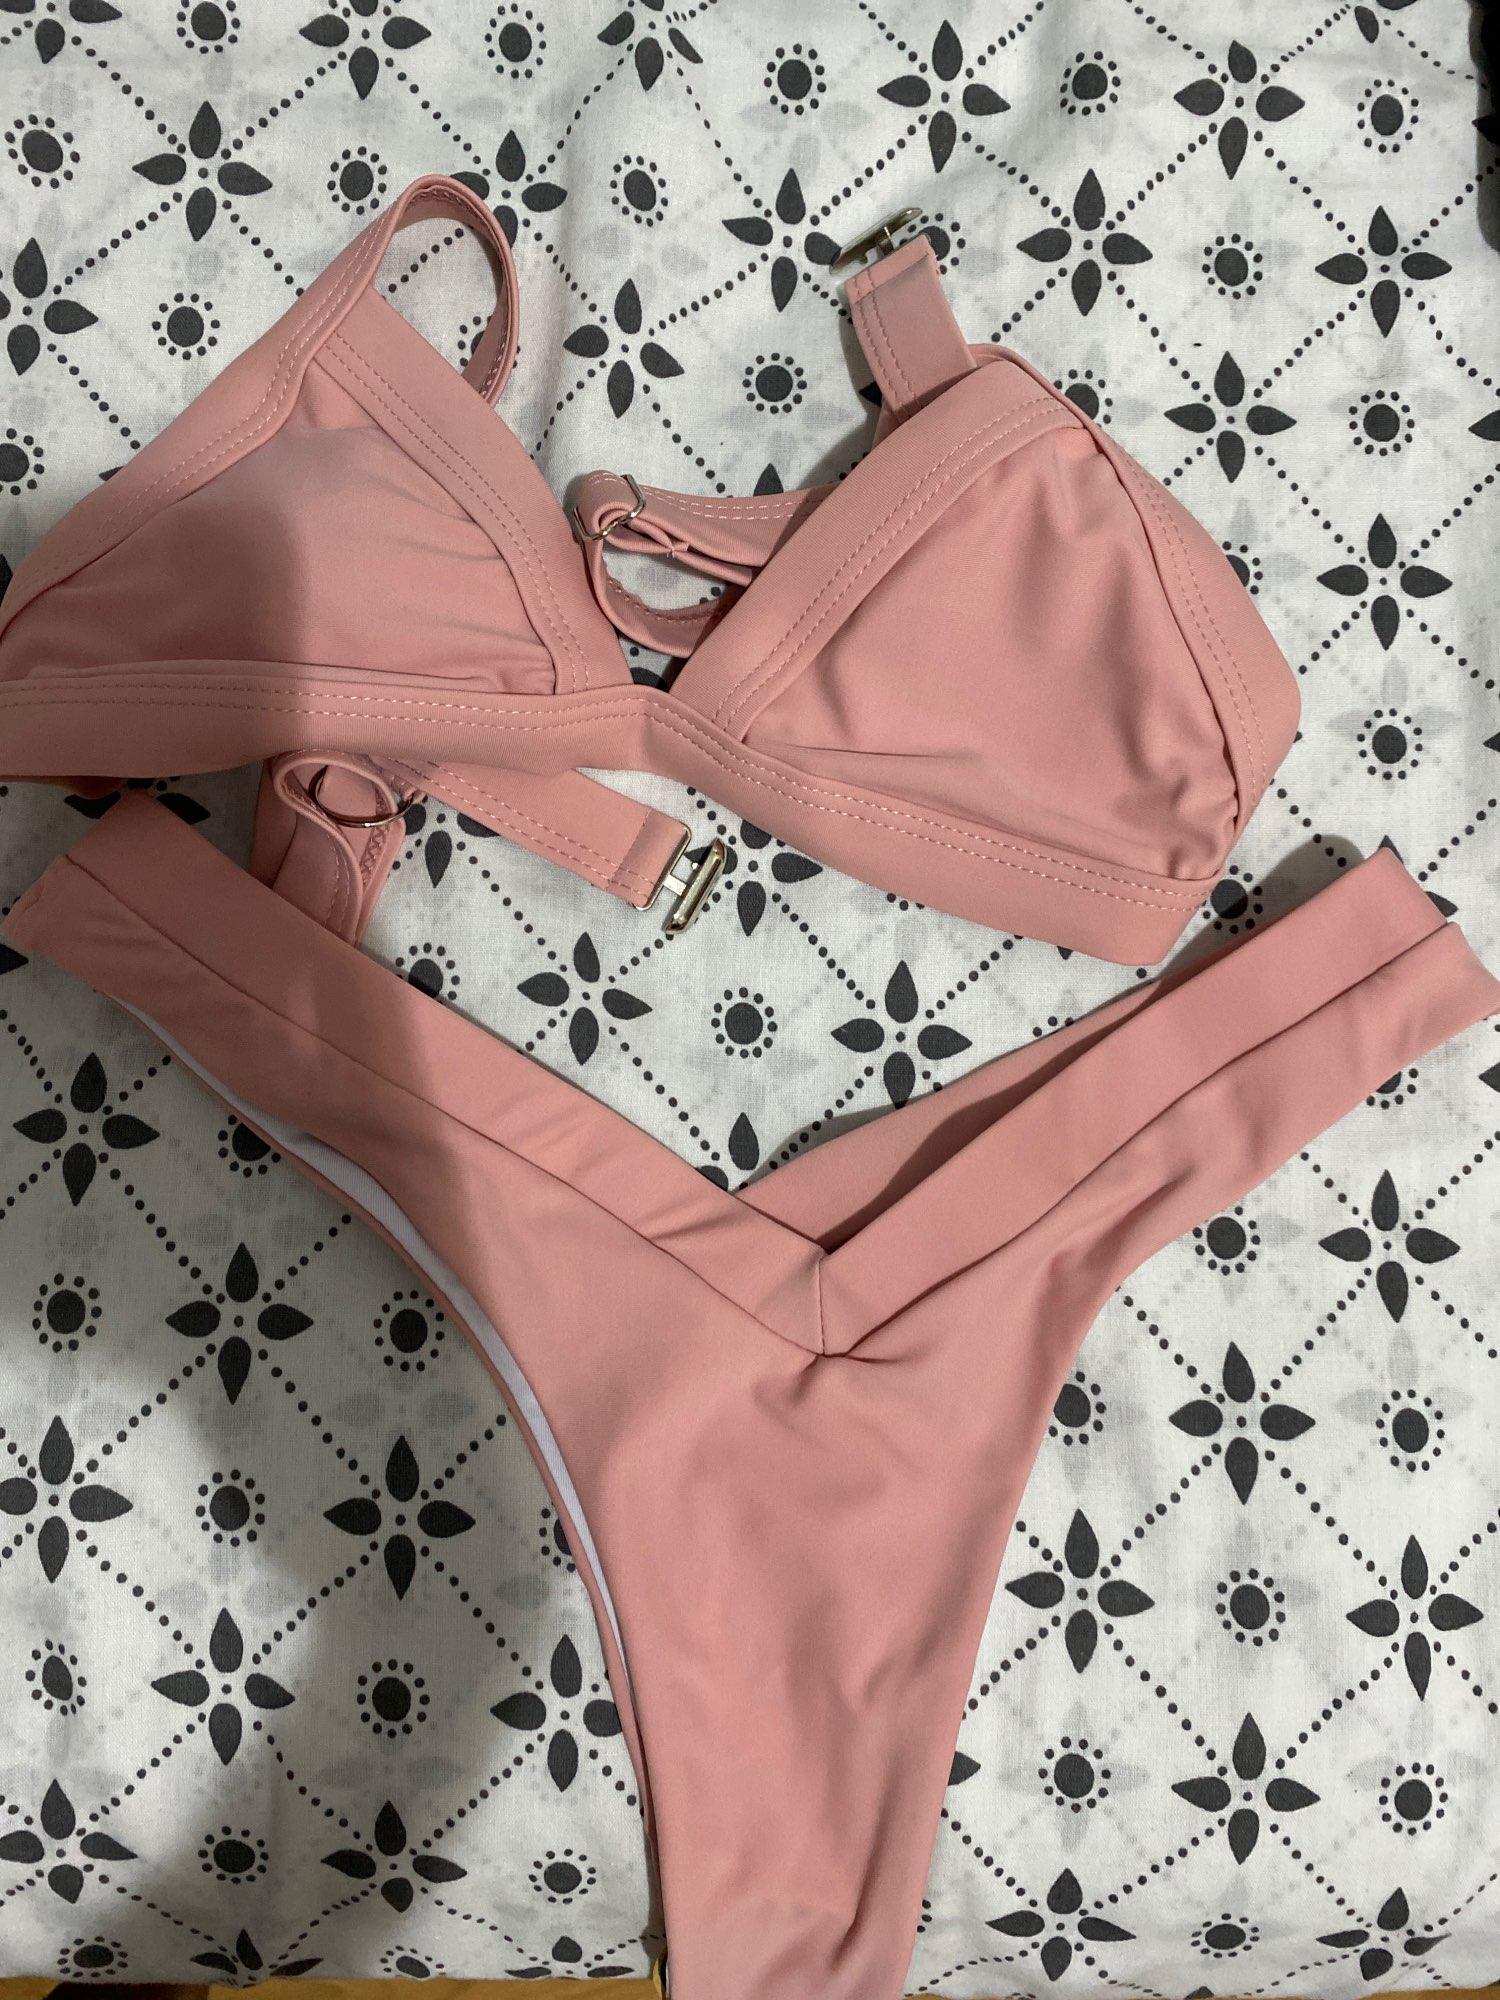 Bikini 2021 Solid Swimsuit Women Swimwear Push Up Bikini Set Patchwork Biquini Brazilian Summer Beach Bathing Suit Swim Wear|Bikini Set|   - AliExpress